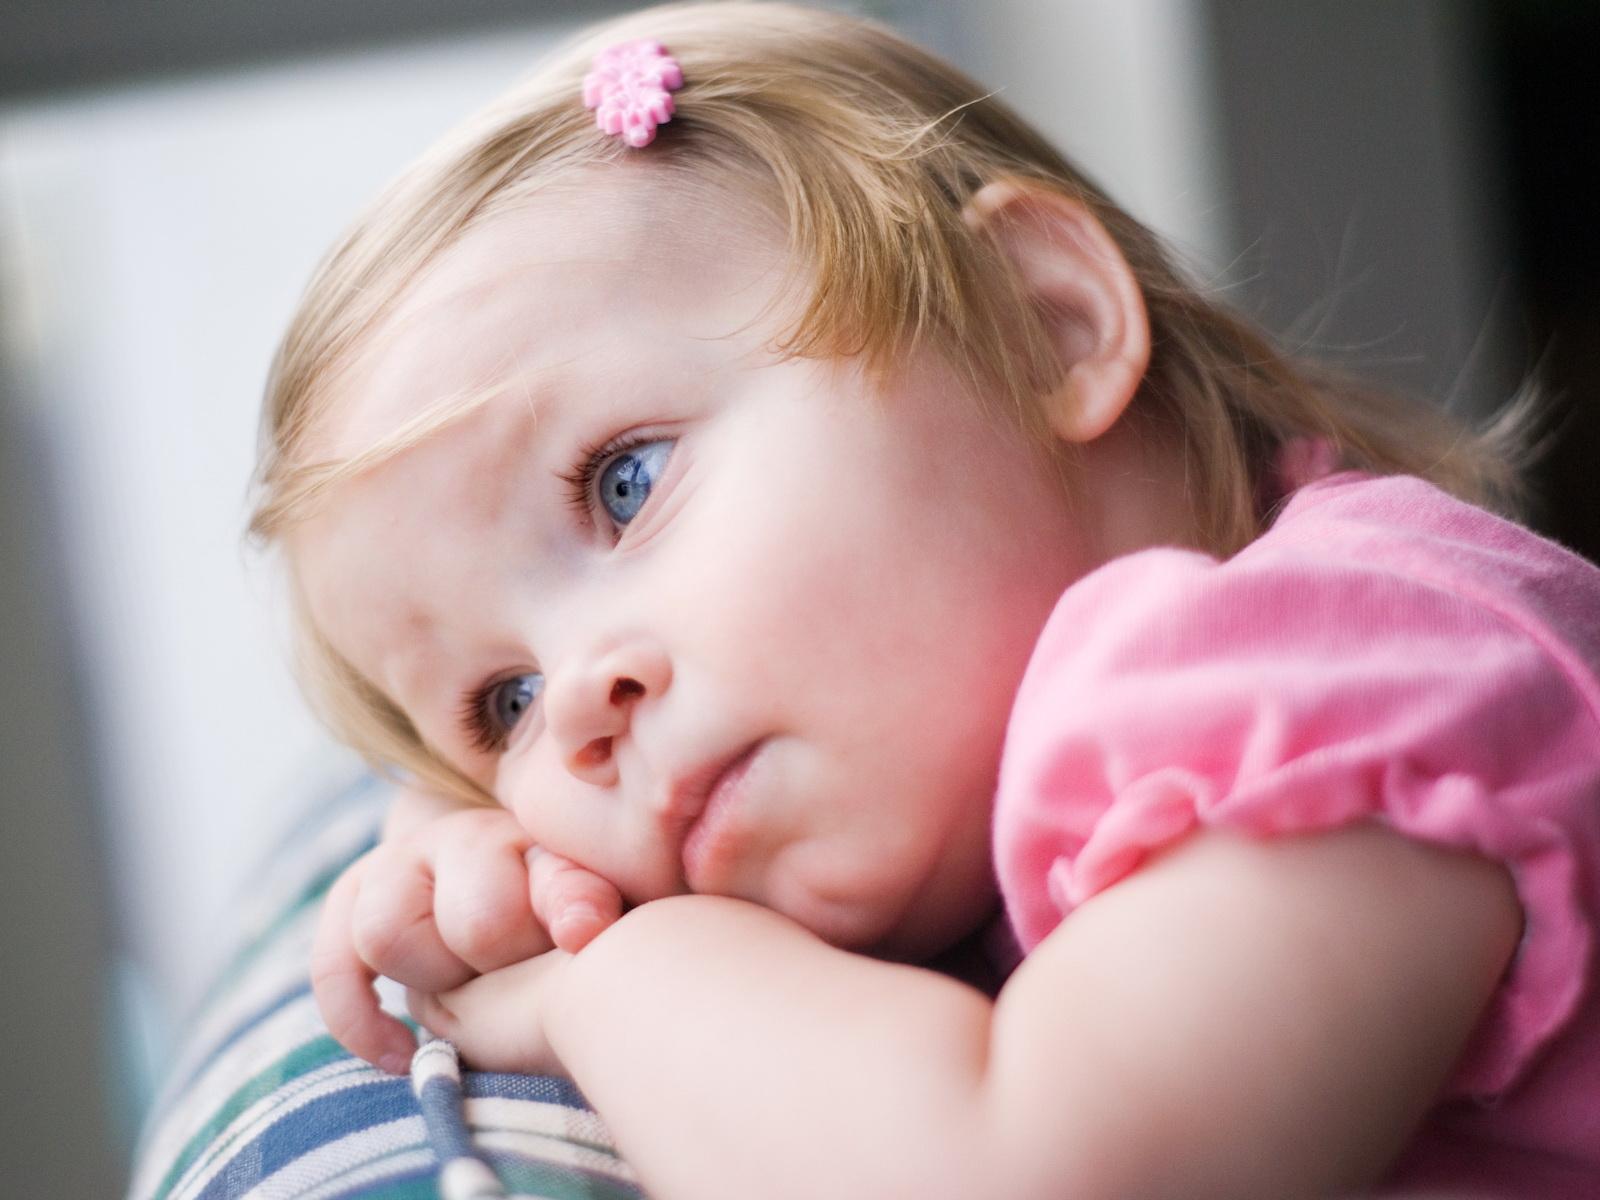 http://2.bp.blogspot.com/-s8r4aaKQVGQ/T0kvK4ZZ0RI/AAAAAAAAACI/O-GMhI0vTAM/s1600/sleeping%20baby.jpg